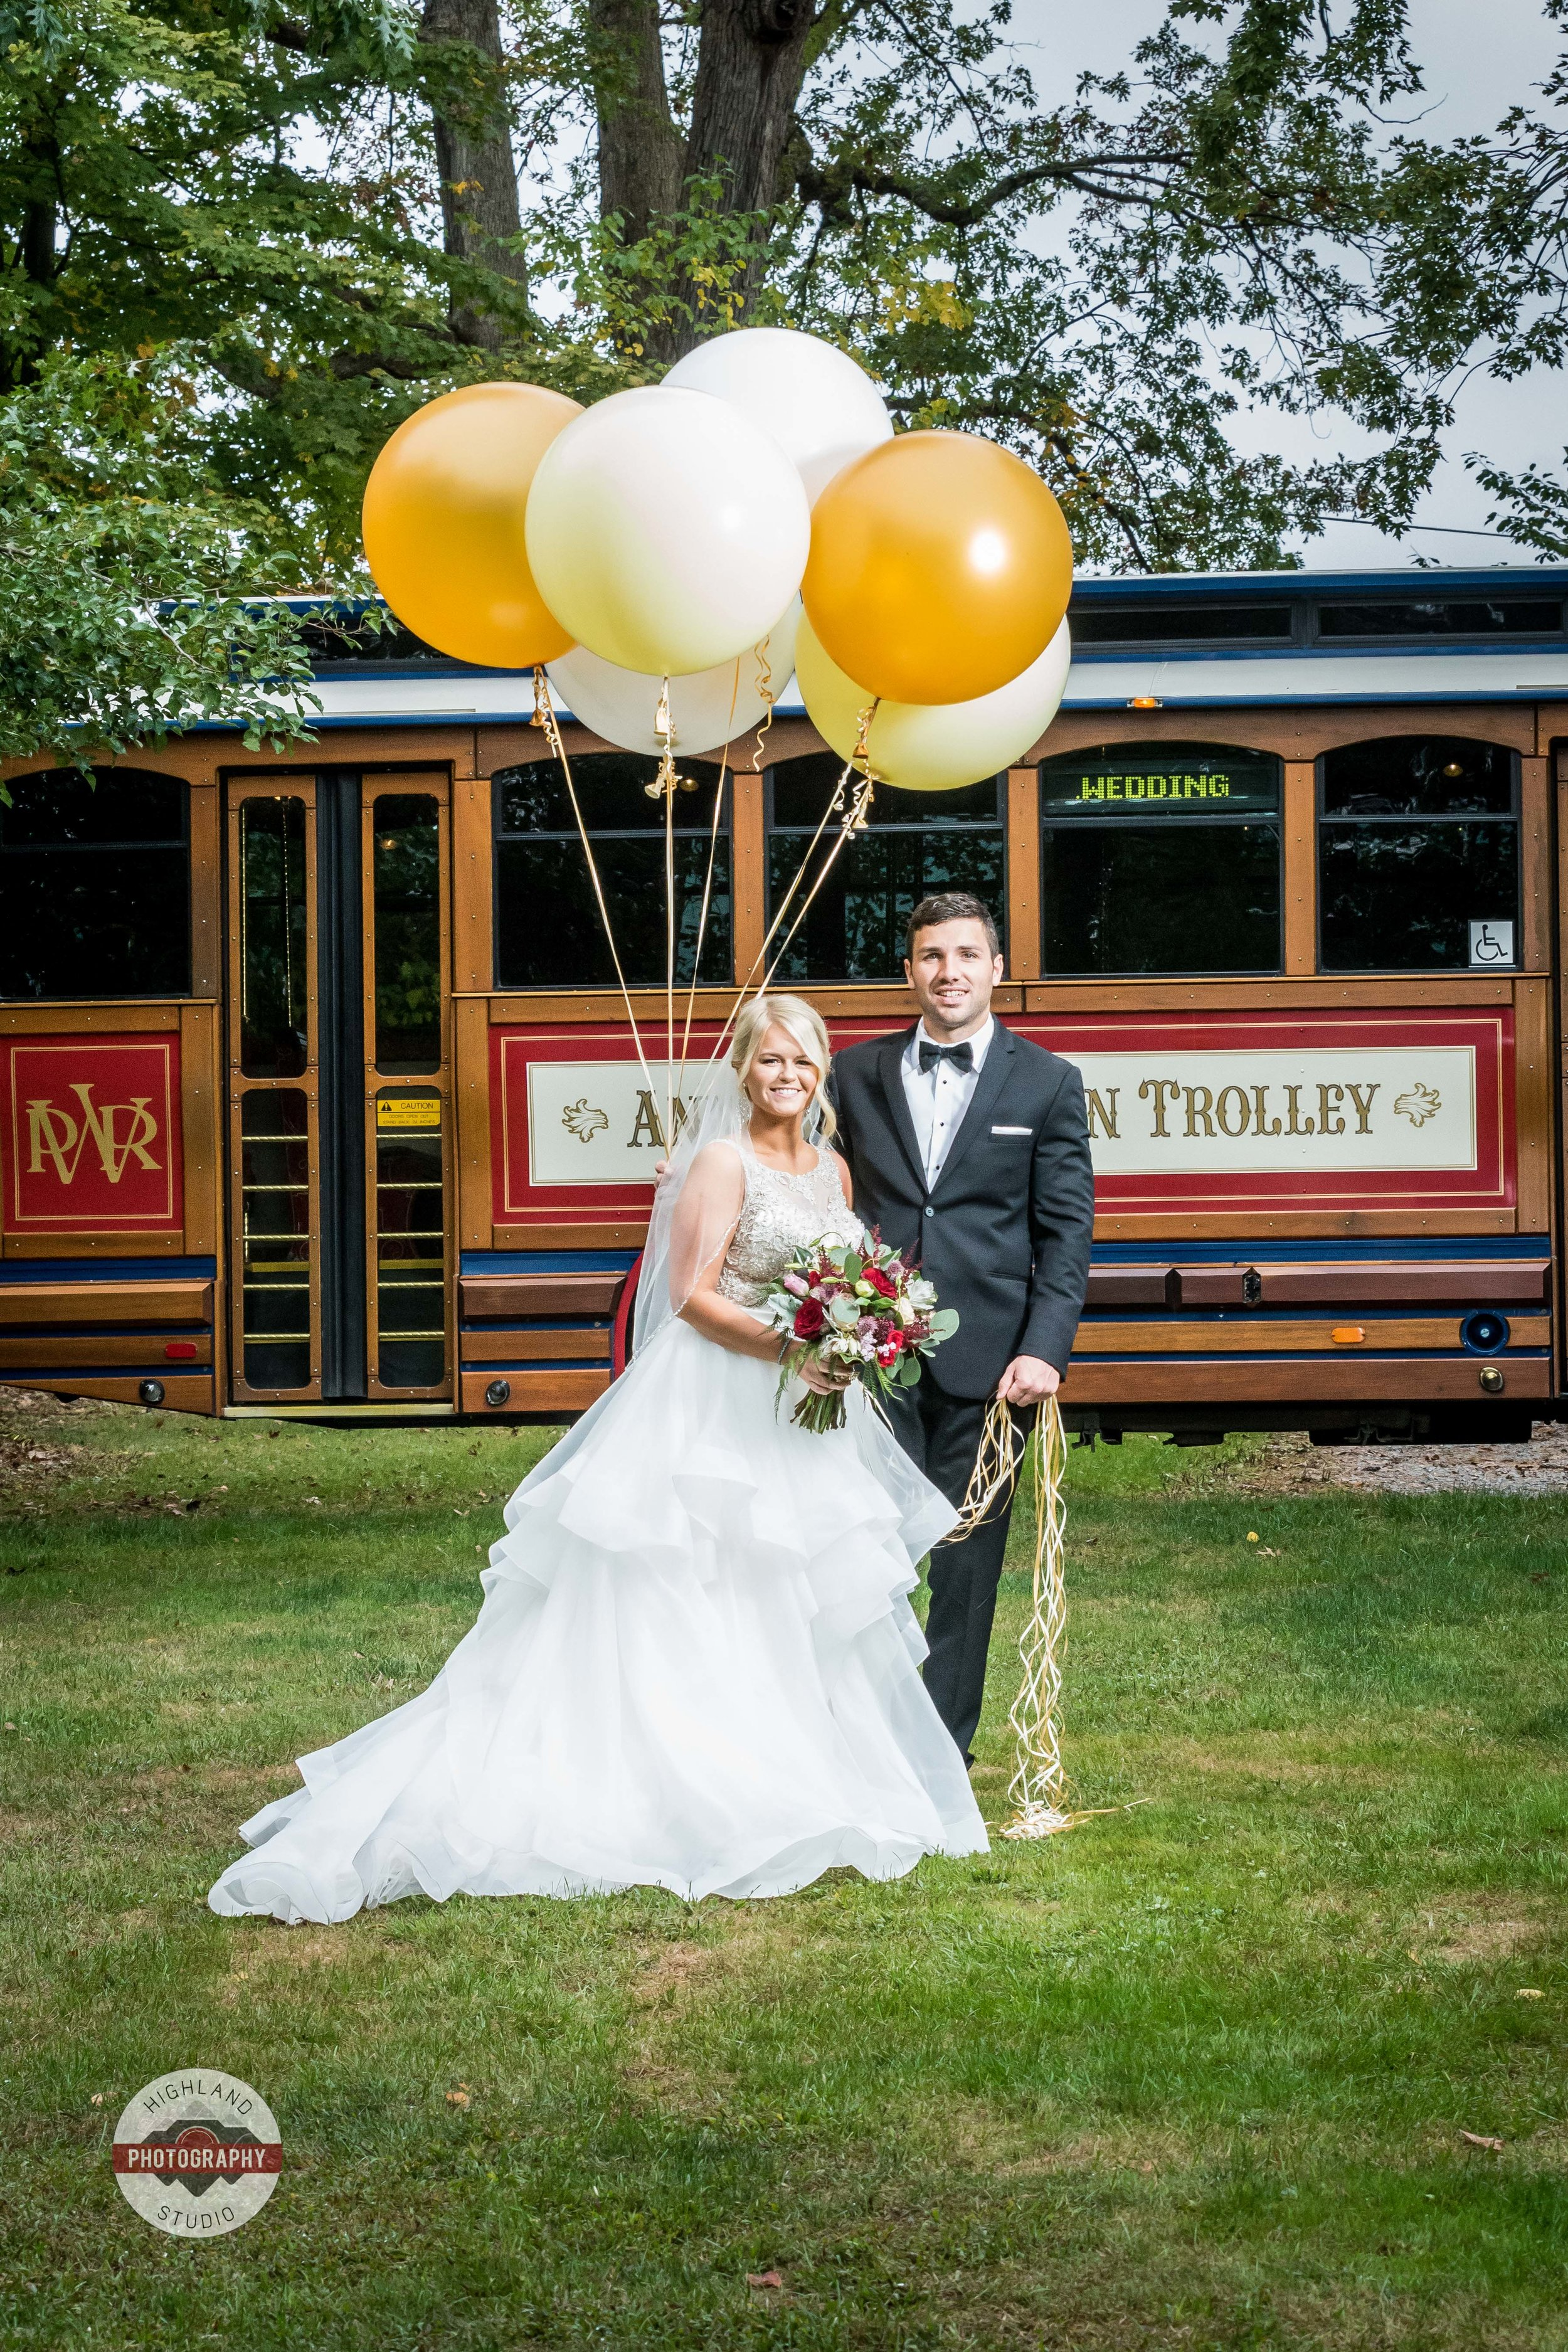 Highland Photography Studio-Wedding Photography-23.jpg